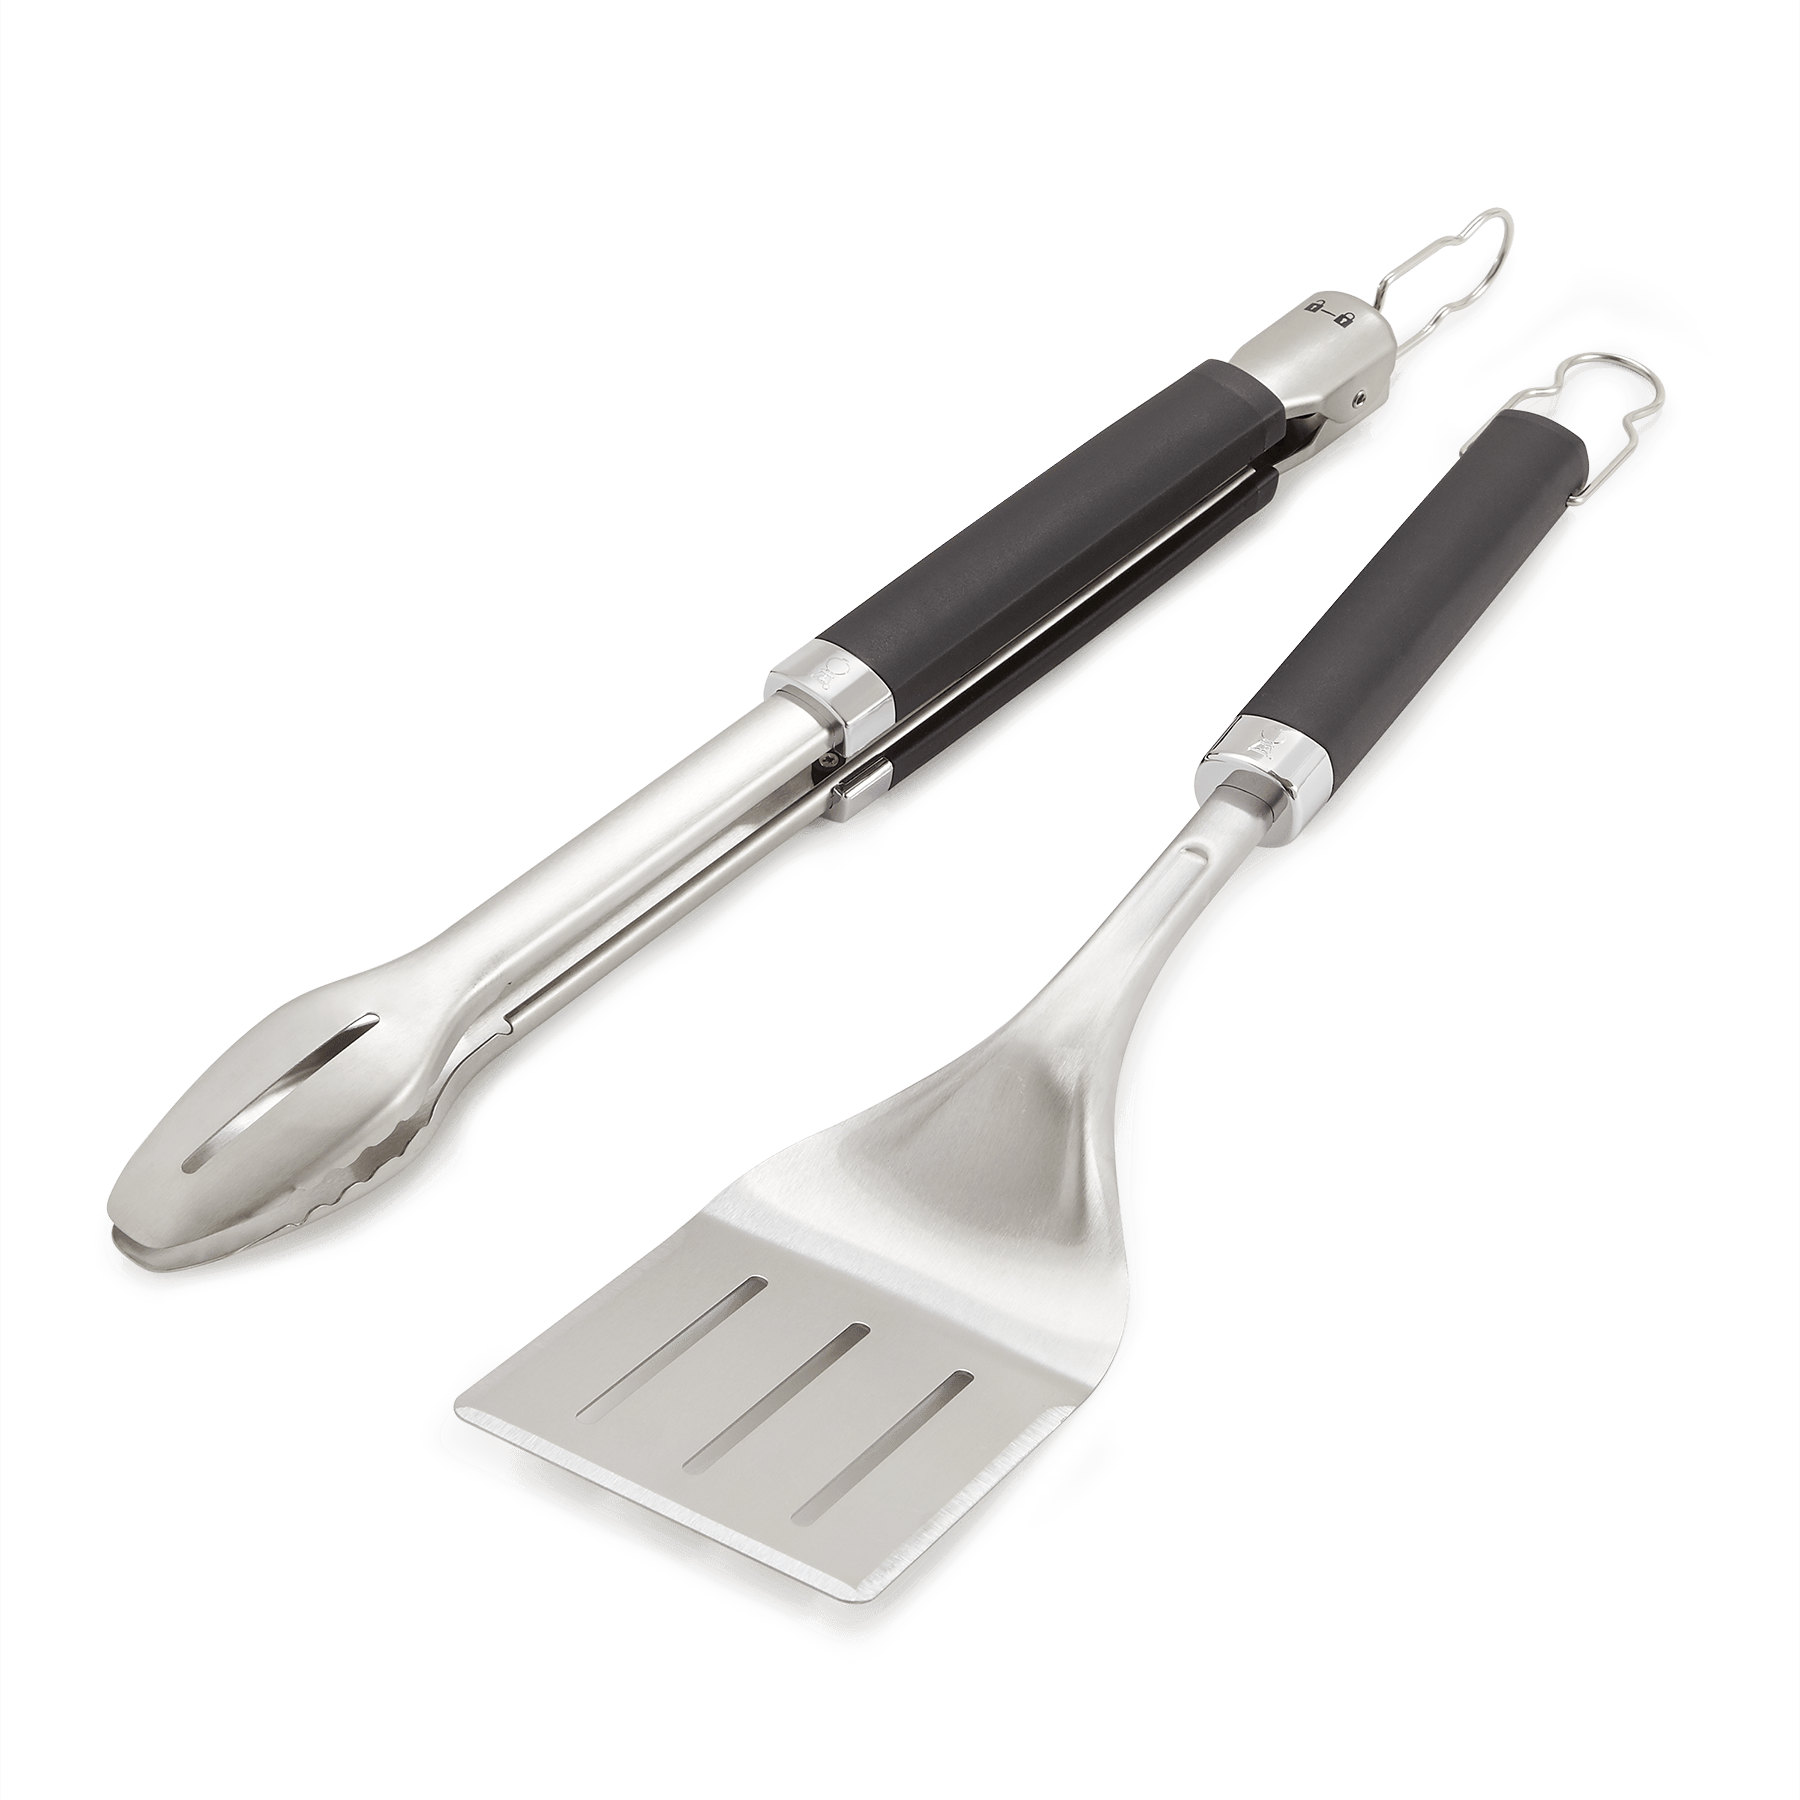 Precision Grillbesteck-Set, 2-teilig